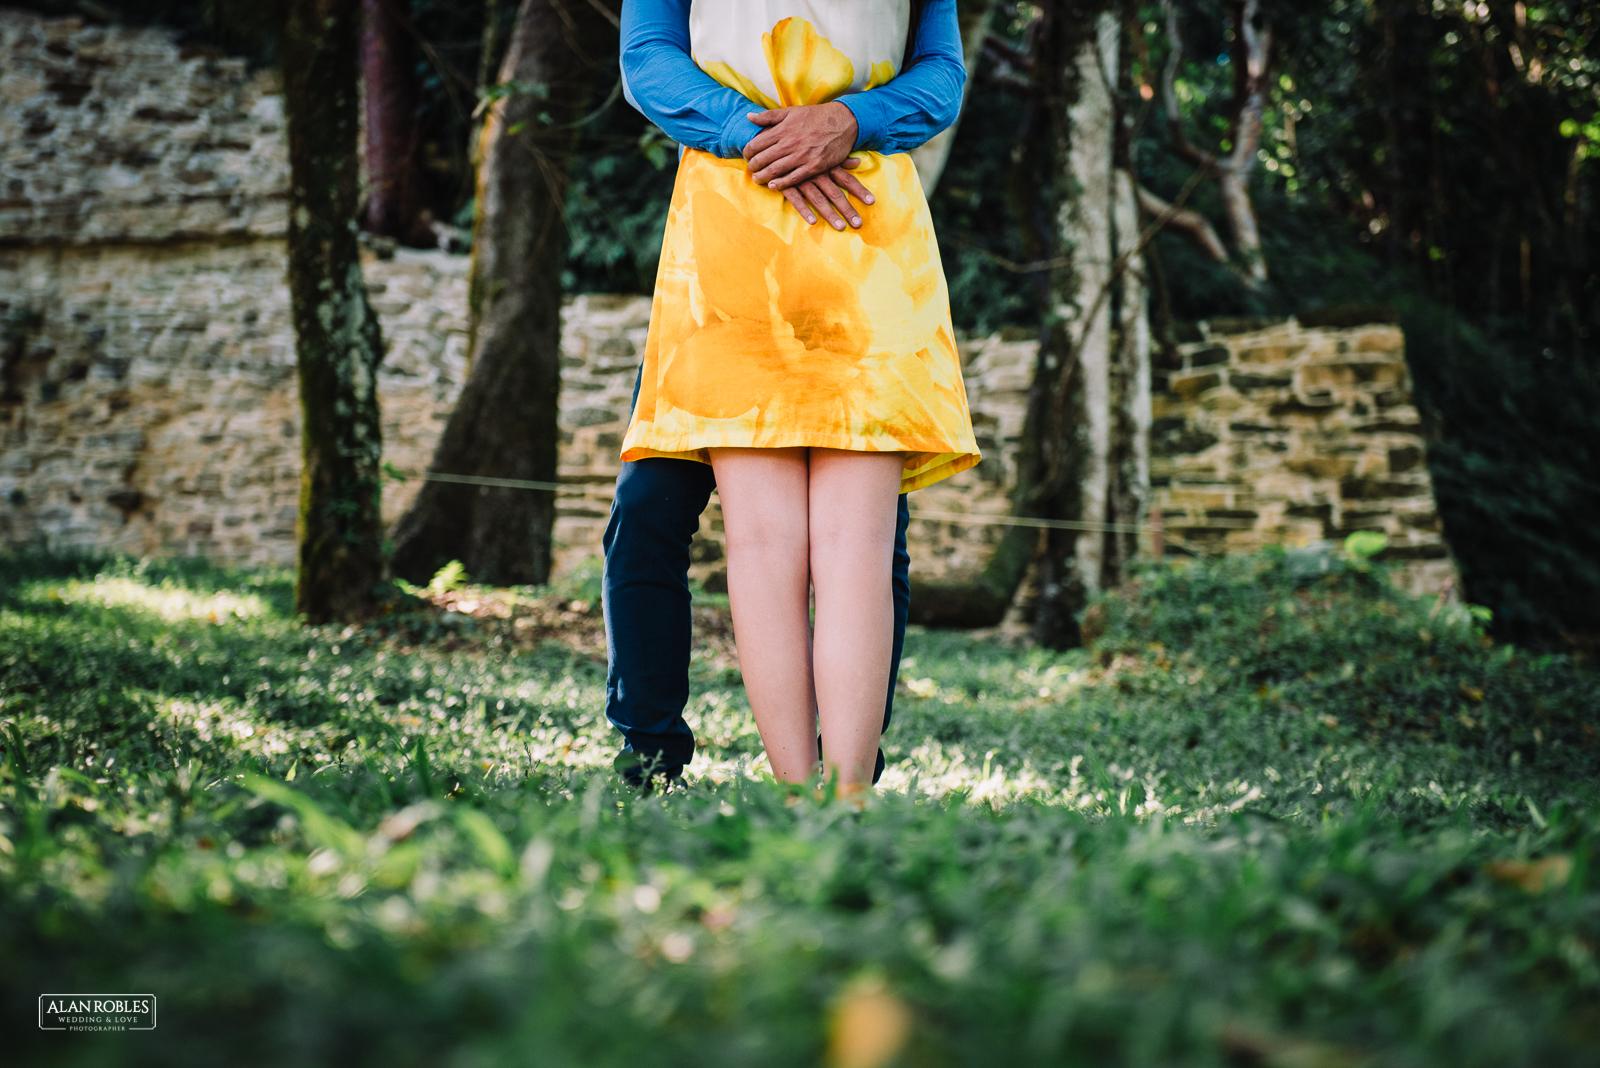 Fotografo de bodas Alan Robles-Pre boda Chiapas-45